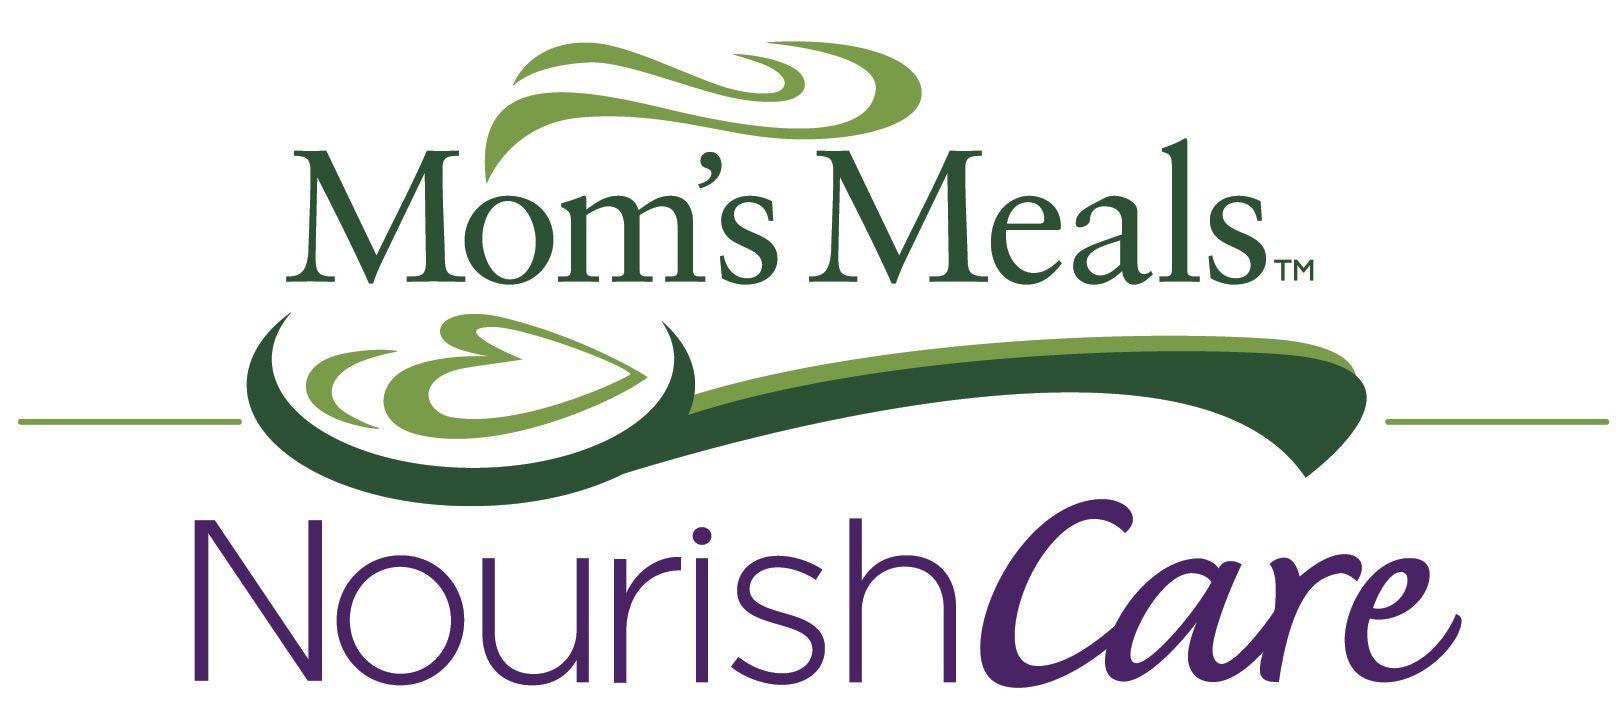 BRONZE - Moms Meal NourishCare